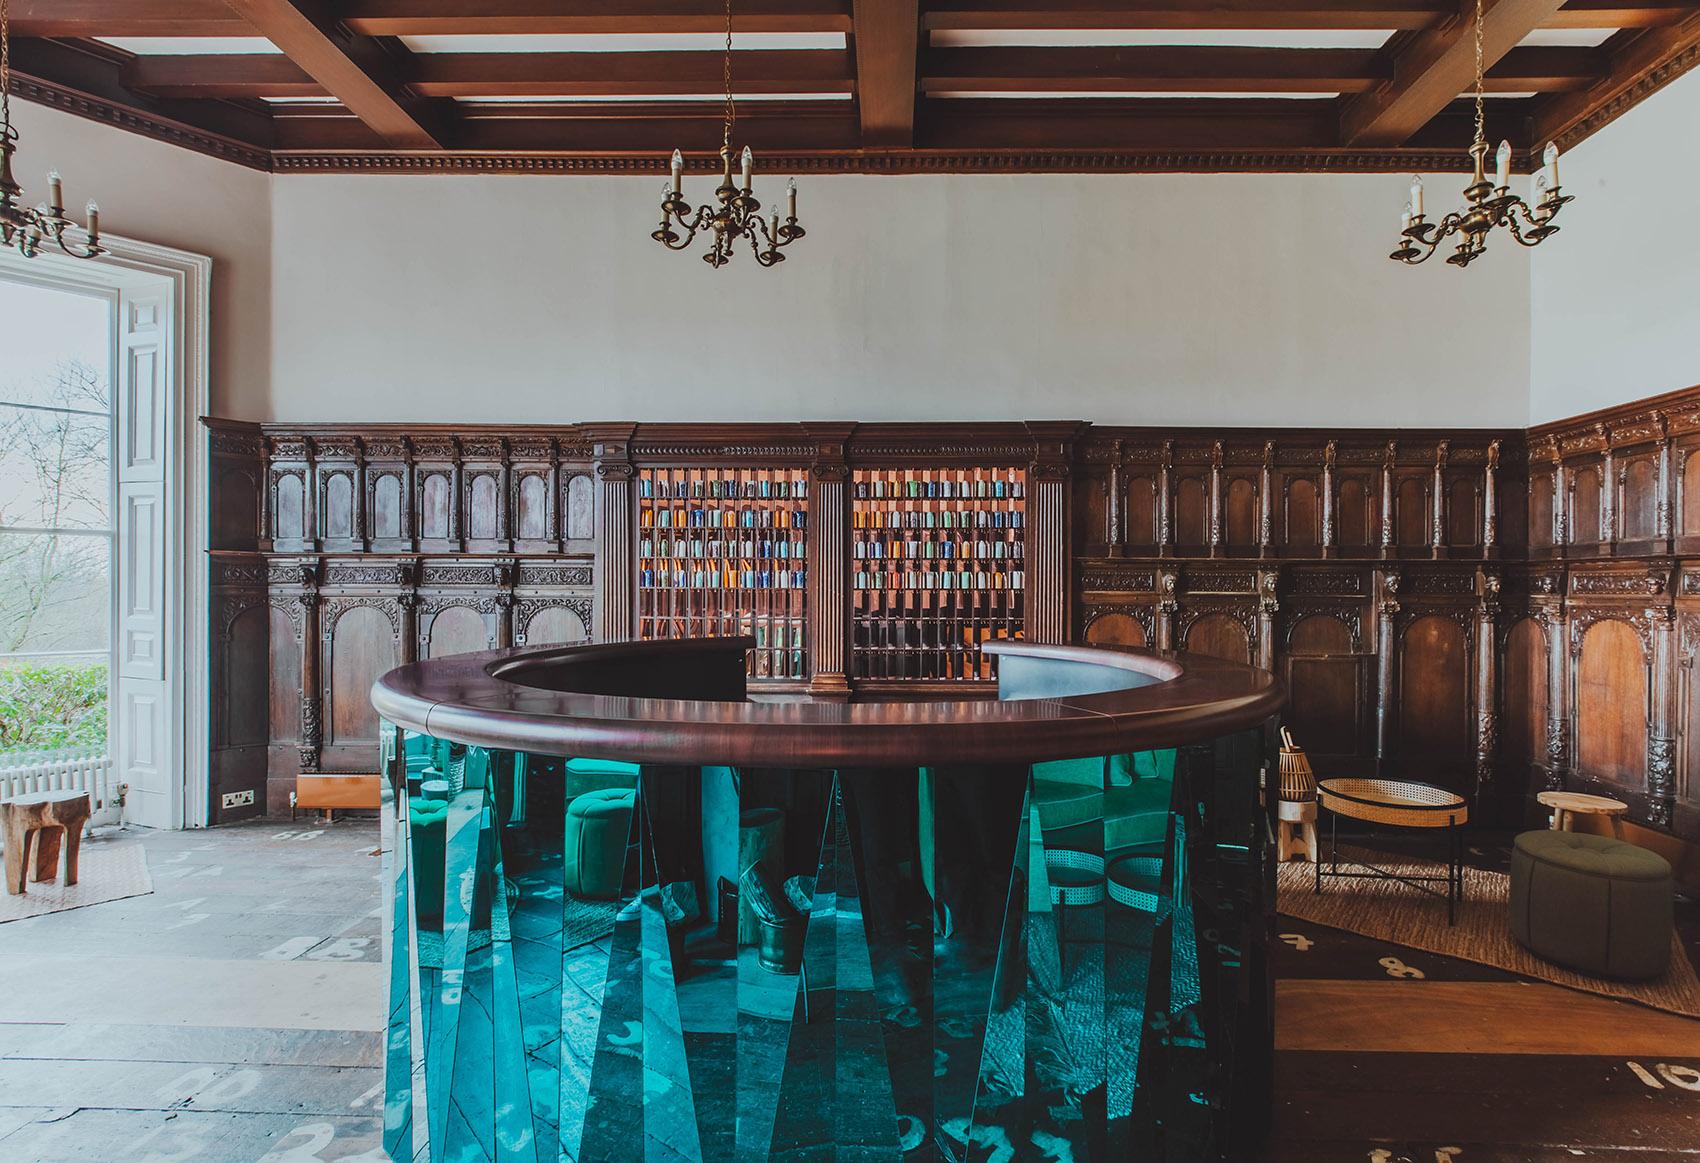 Birch酒店室内改造,伦敦  Red Deer